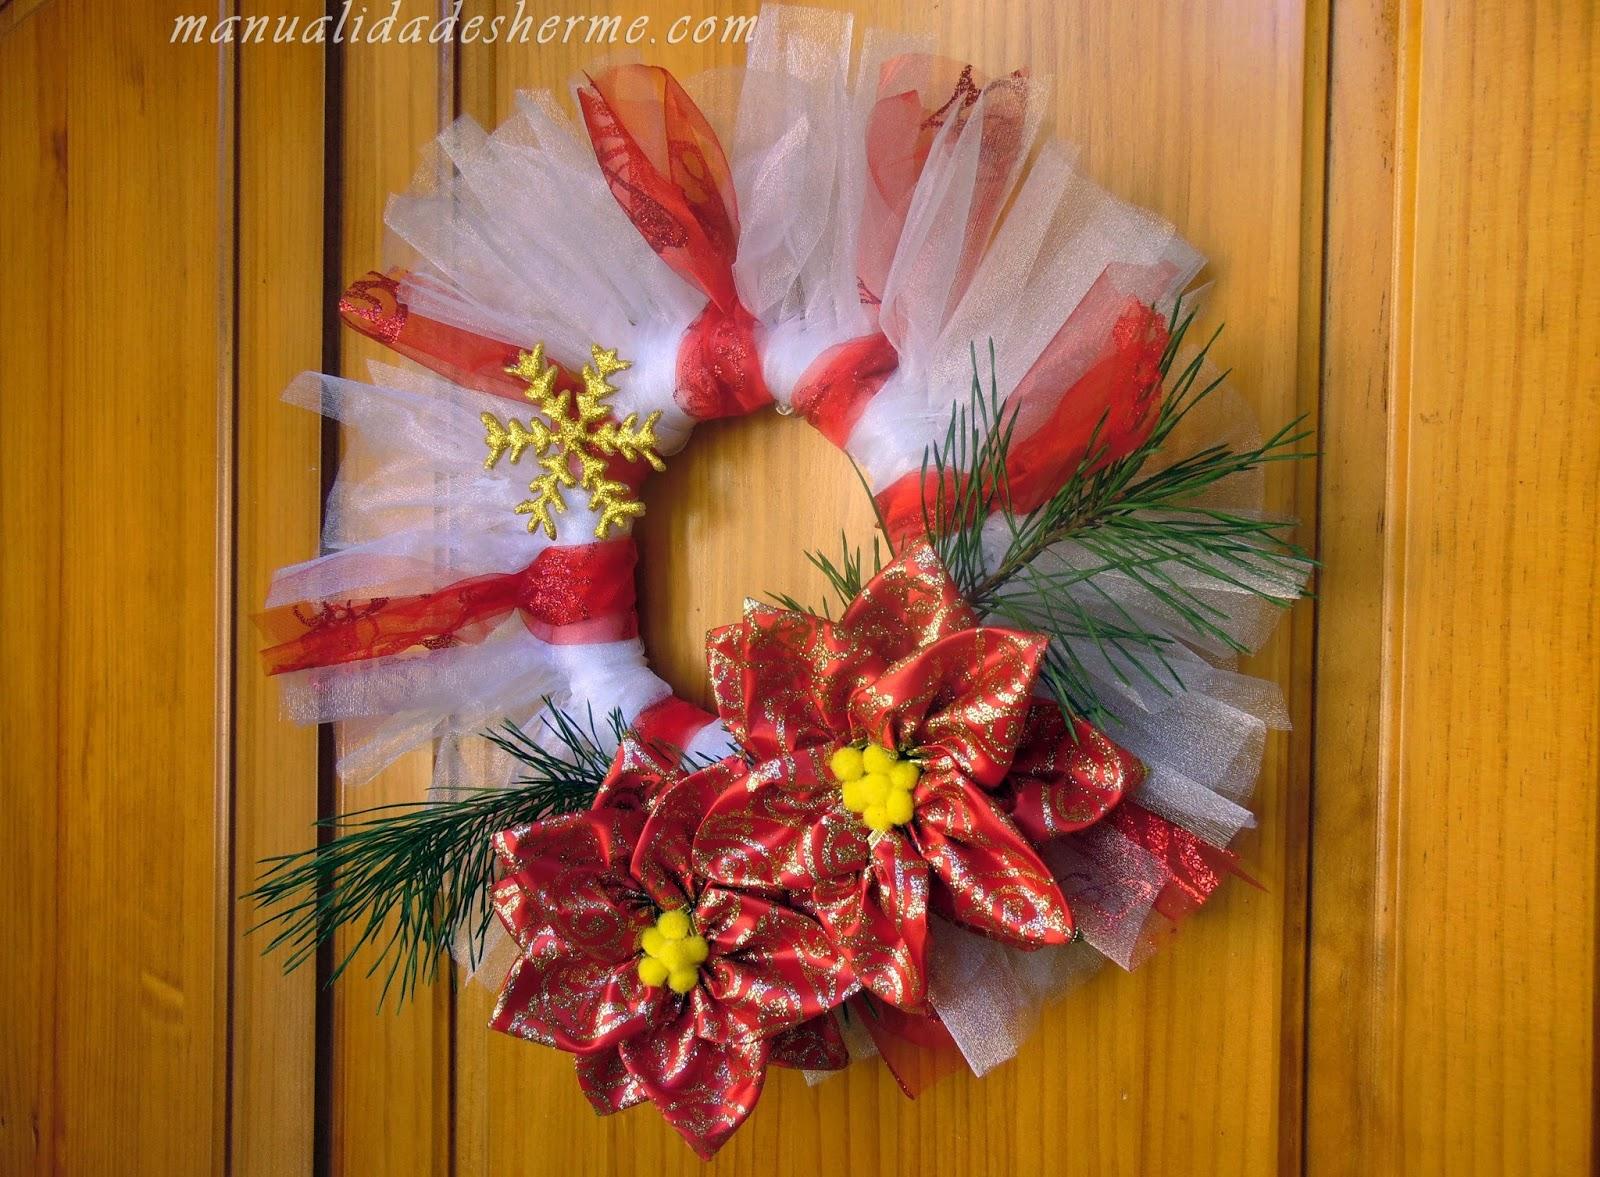 Manualidades herme como hacer flores para decorar en navidad - Manualidades para decorar la mesa en navidad ...